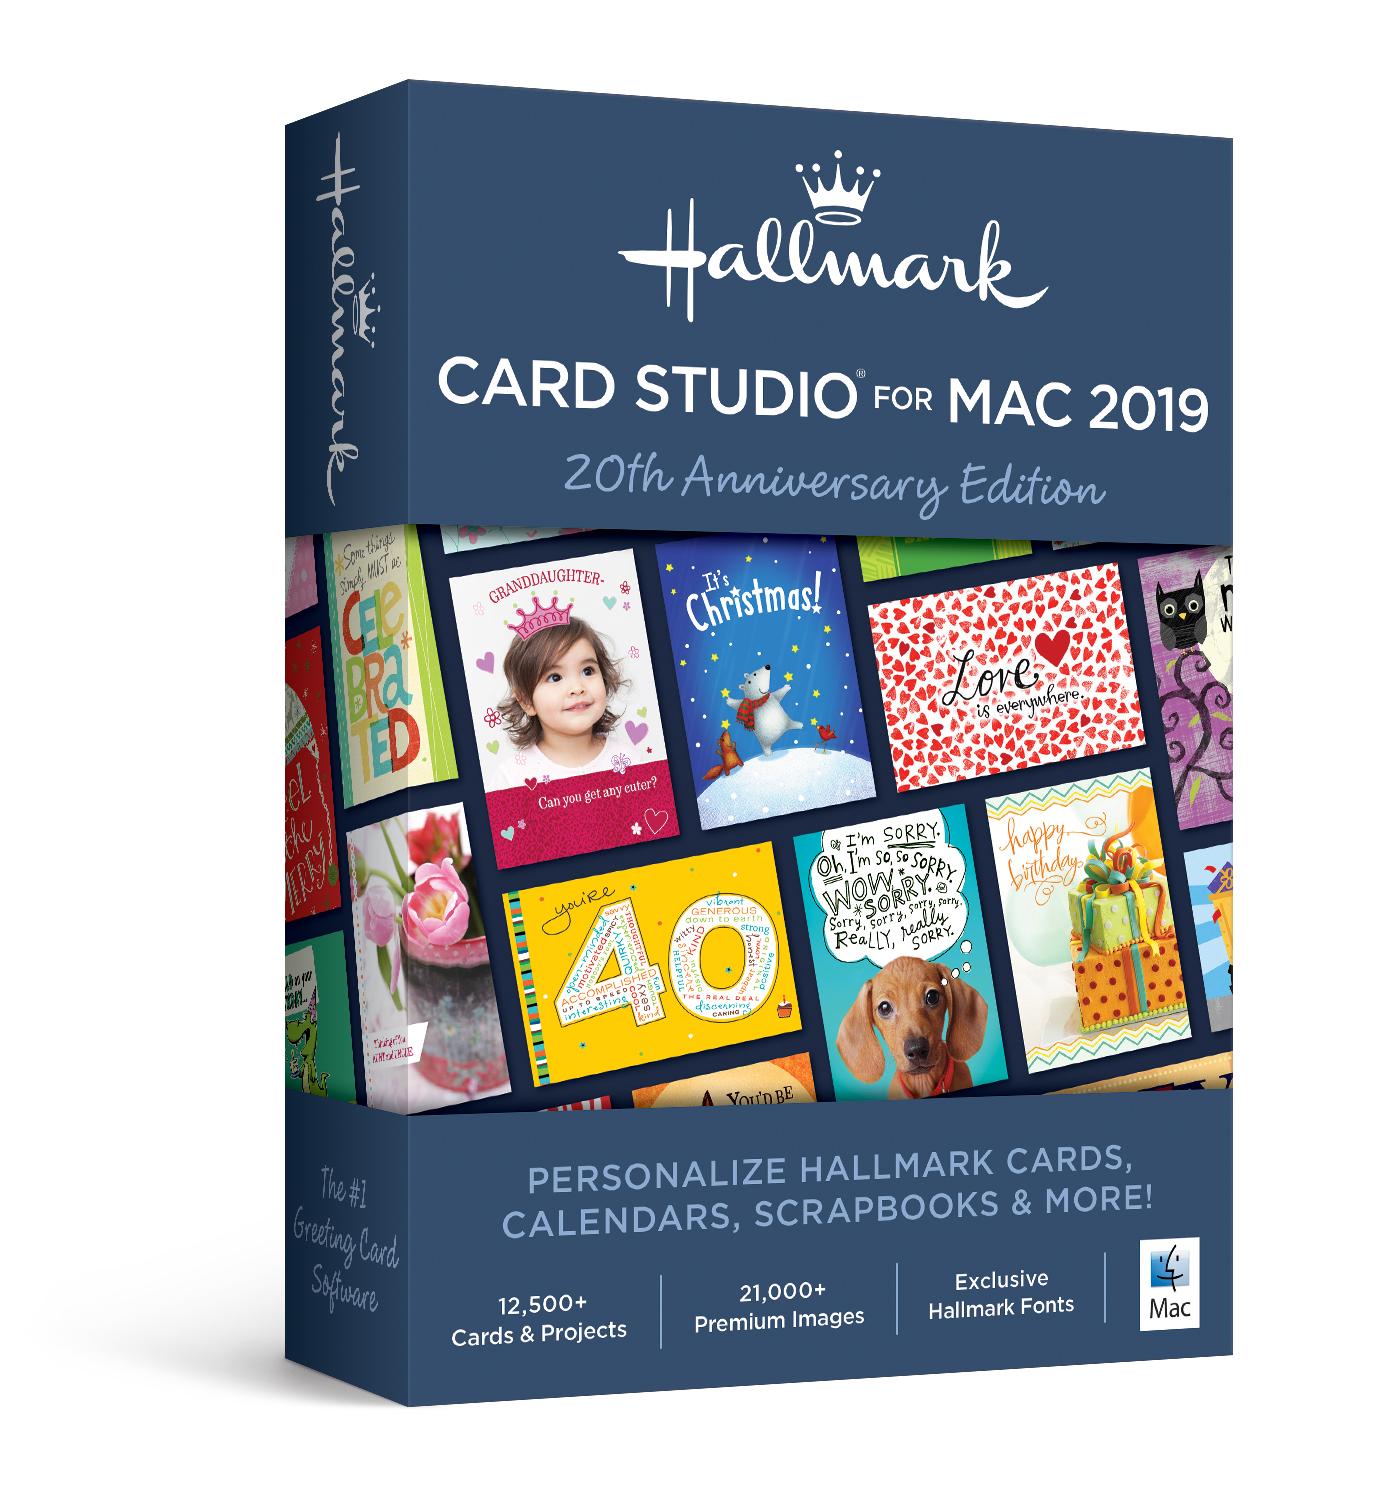 Card studio for mac